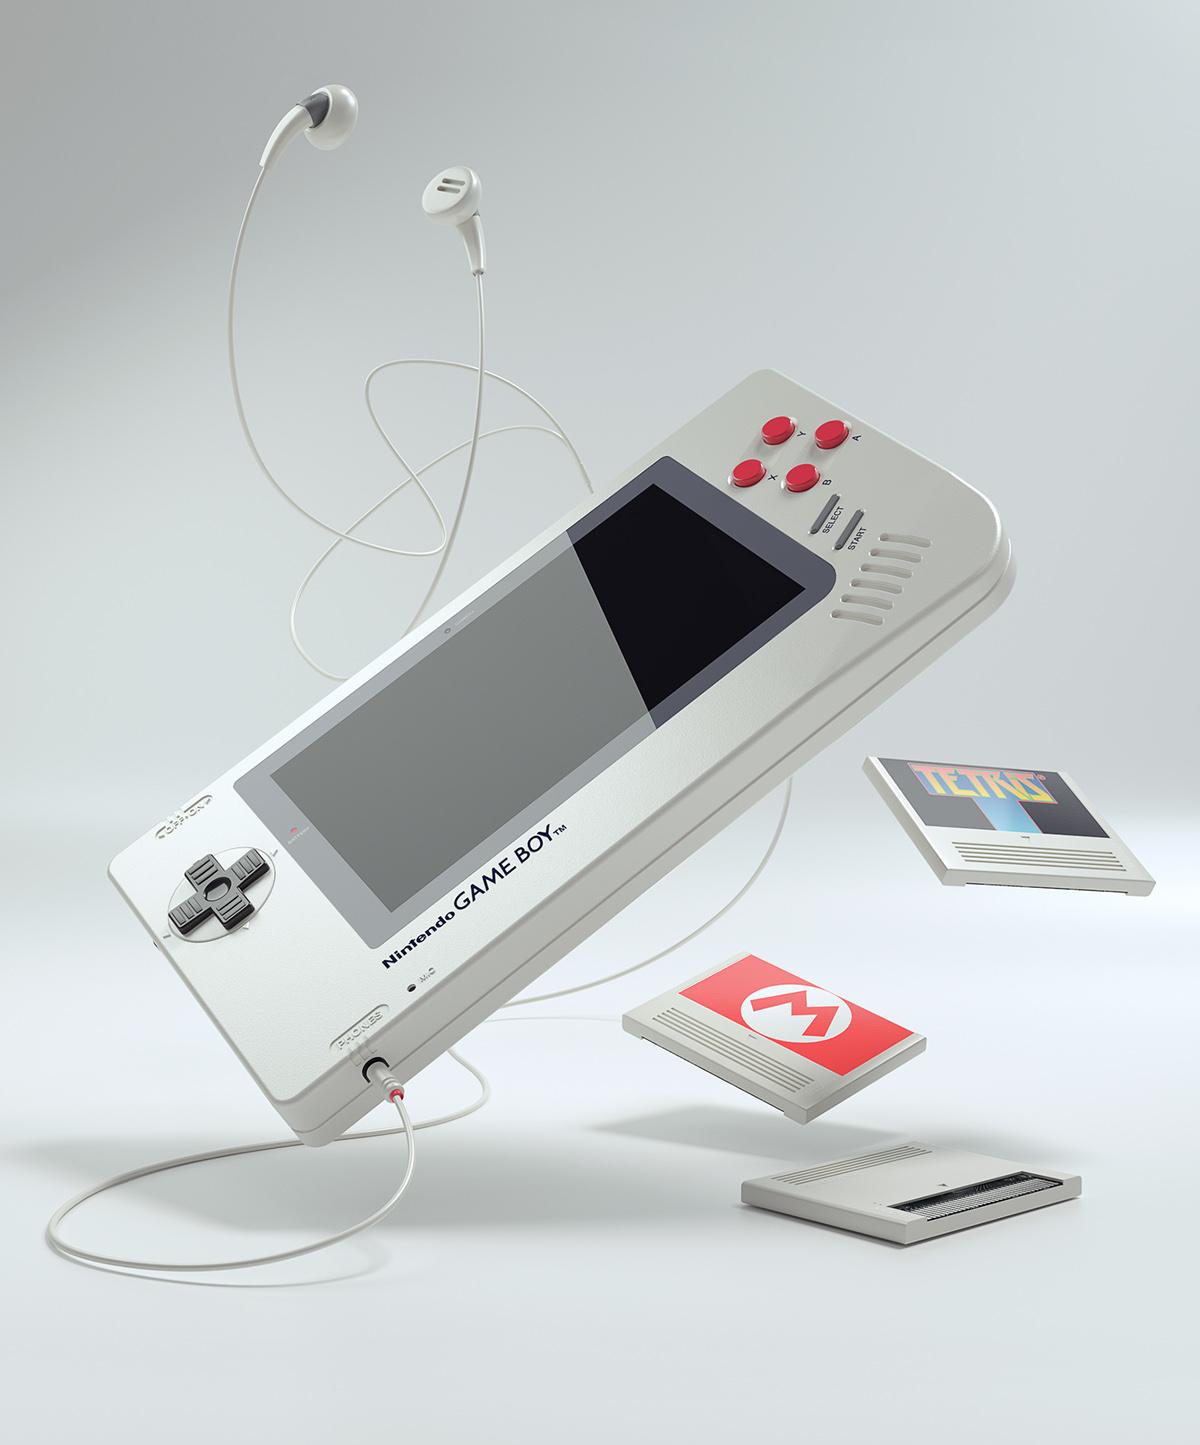 Adobe Portfolio gameboy game boy console handheld cartridge Games Nintendo headphones tetris Super Mario package concept screen headphone